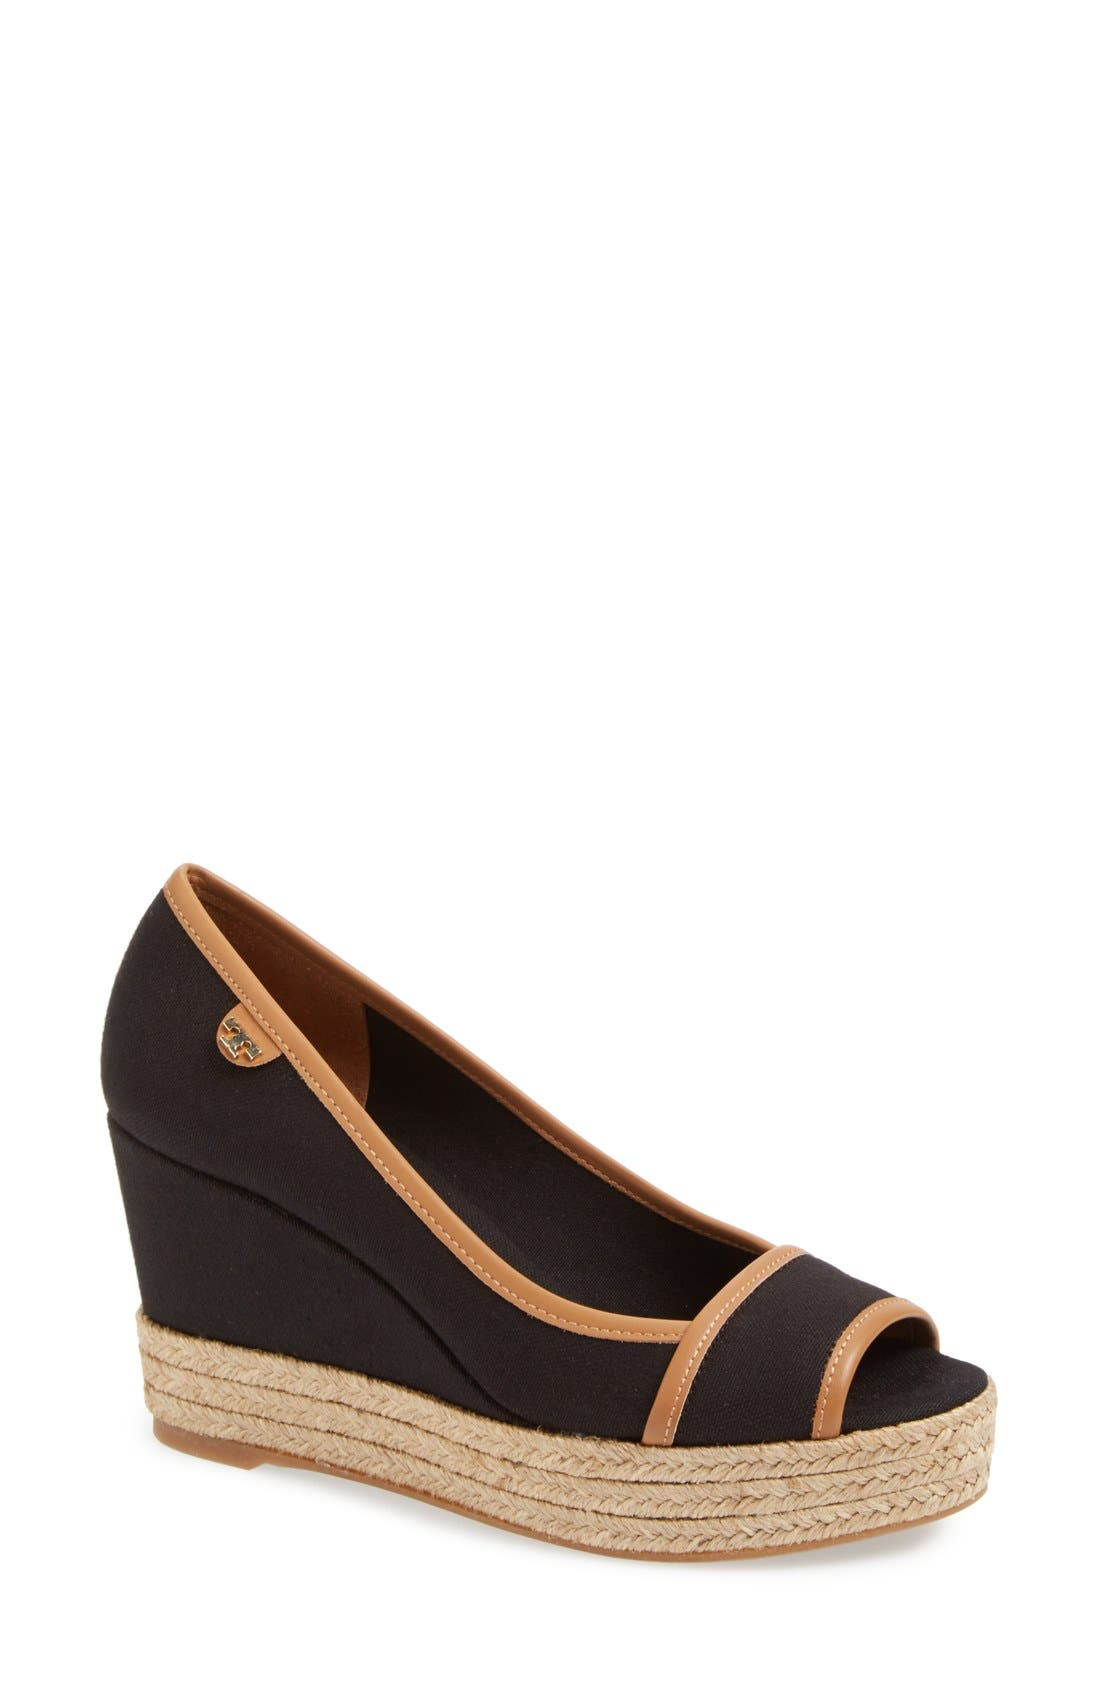 TORY BURCH 'Majorca' Wedge Sandal, Main, color, 013